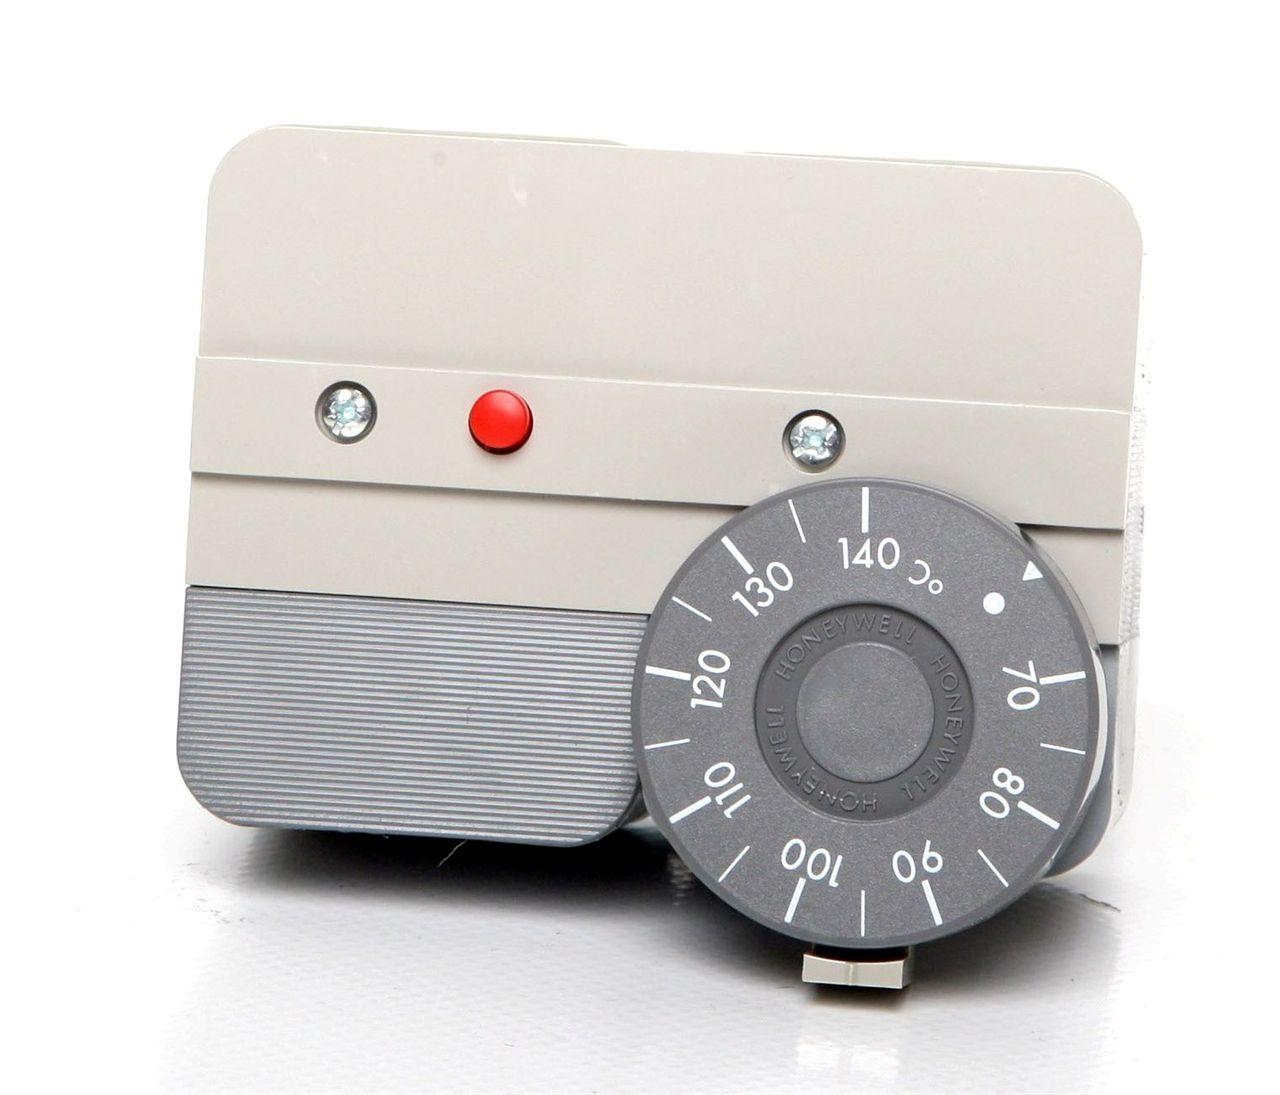 hight resolution of honeywell mercury thermostat wiring diagram switch w get 220 line voltage thermostat 220 line voltage thermostat